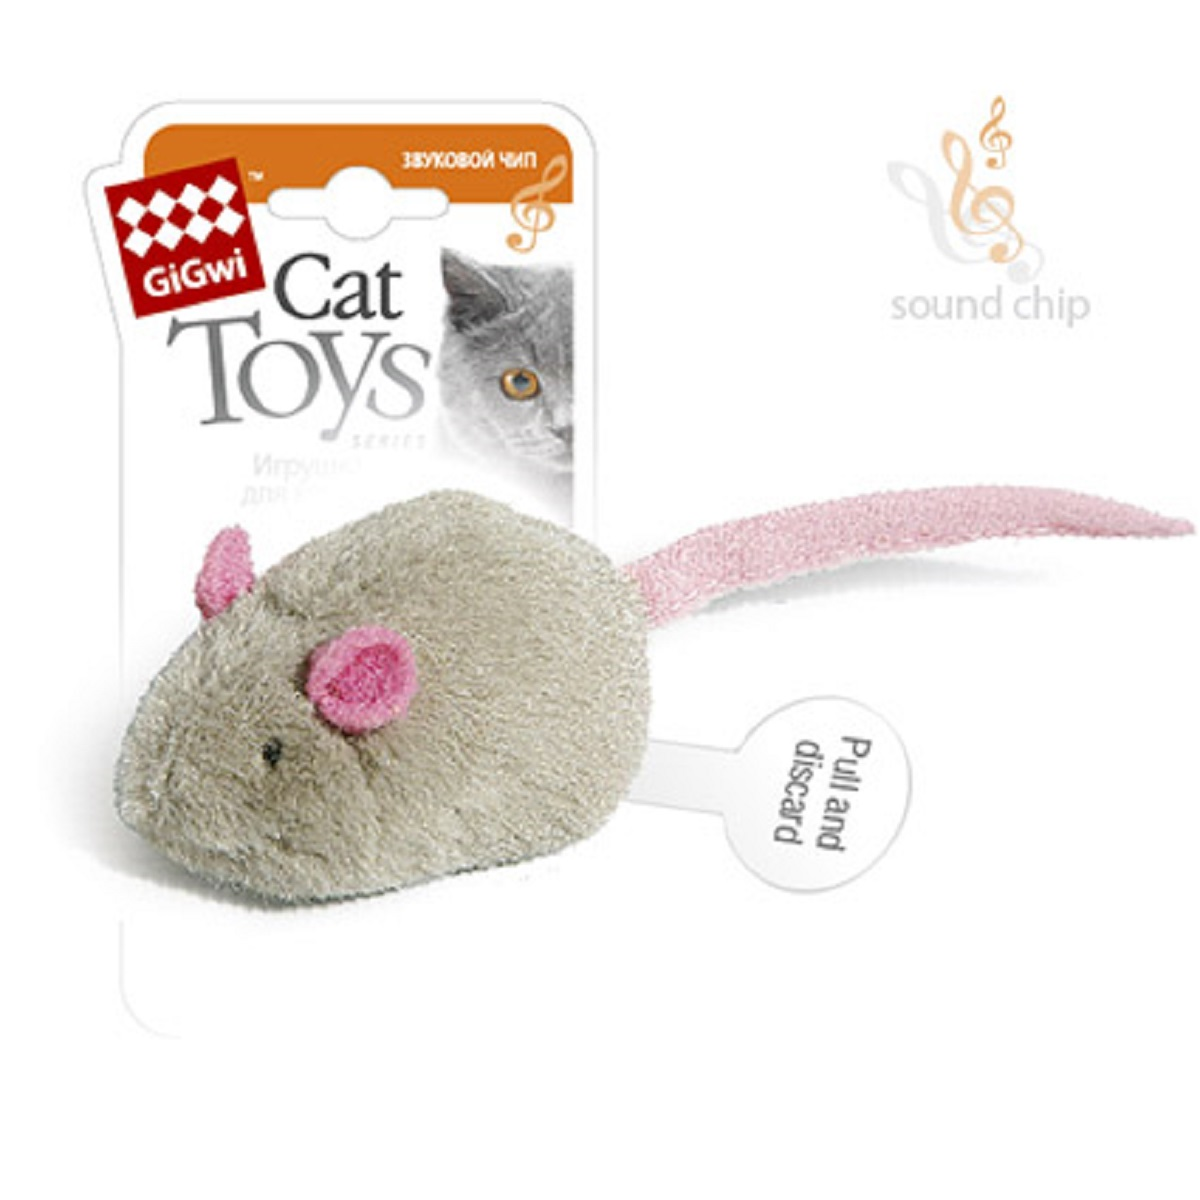 Игрушка для кошек GiGwi Мышка с электронным чипом игрушка gigwi petdroid interactive mouse sound chip inside интерактивная мышка для кошек 75359